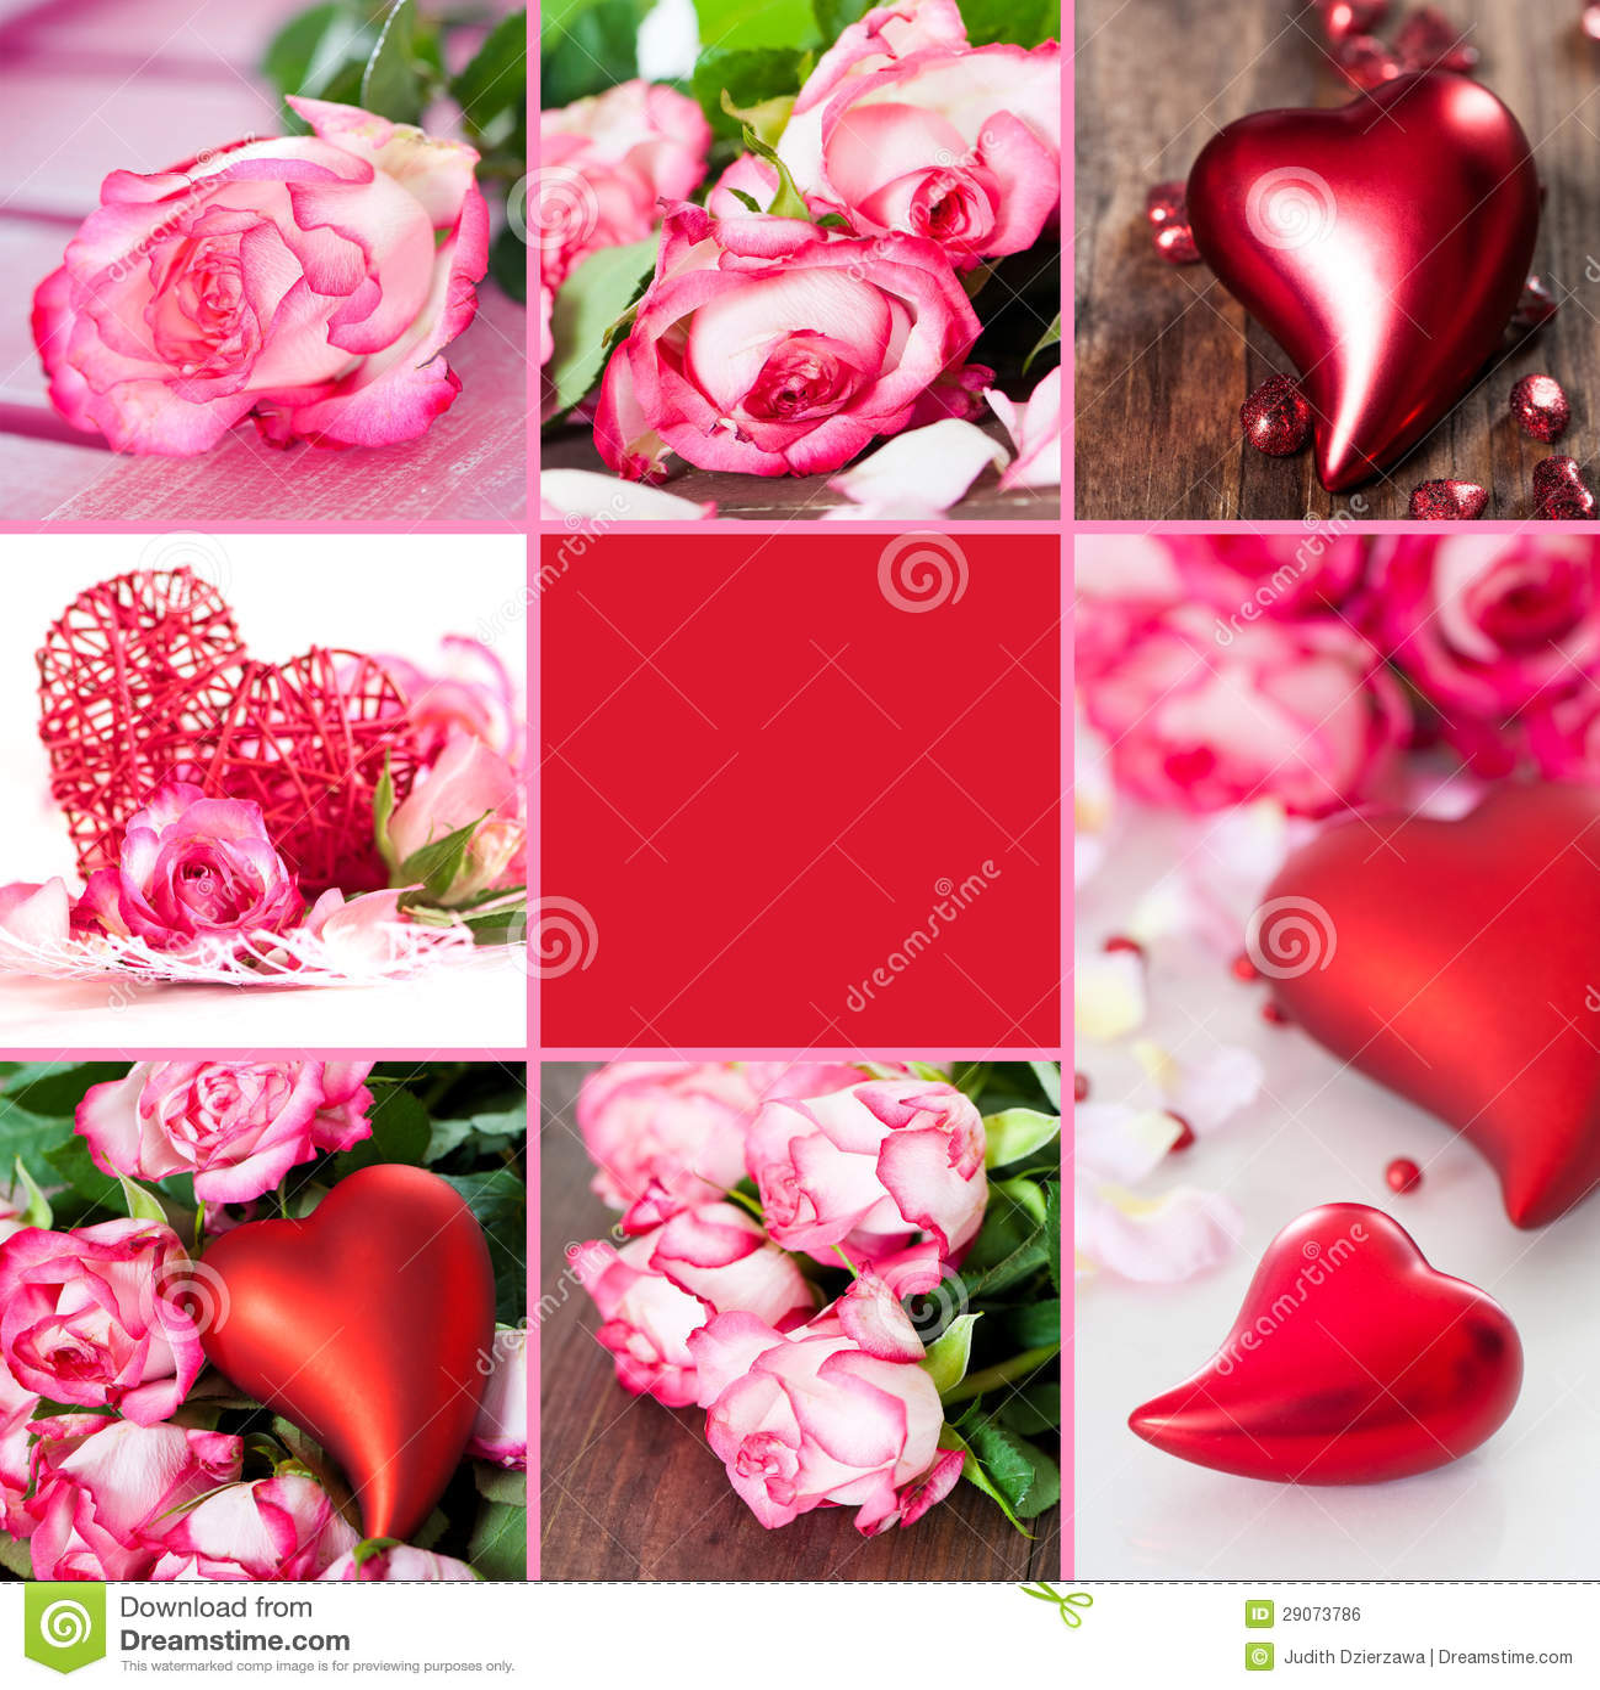 Elegant Valentines Collage Royalty Free Stock Image   Image: 29073786